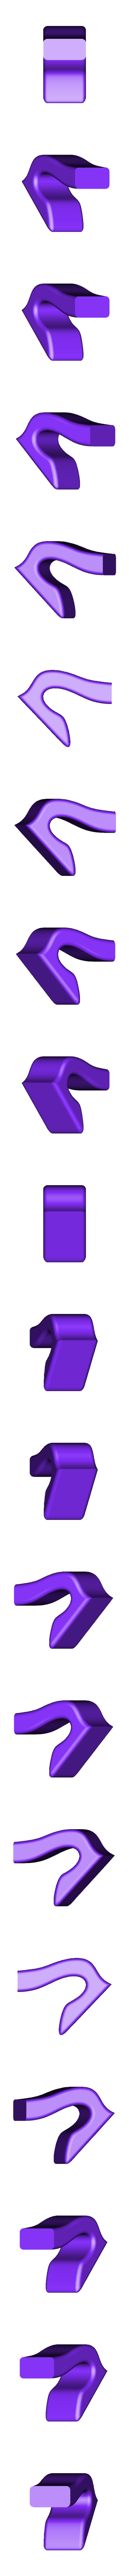 07-hook.stl Download STL file DOUGLAS F4D SKYRAY  • 3D printer object, 3DprintedArmy